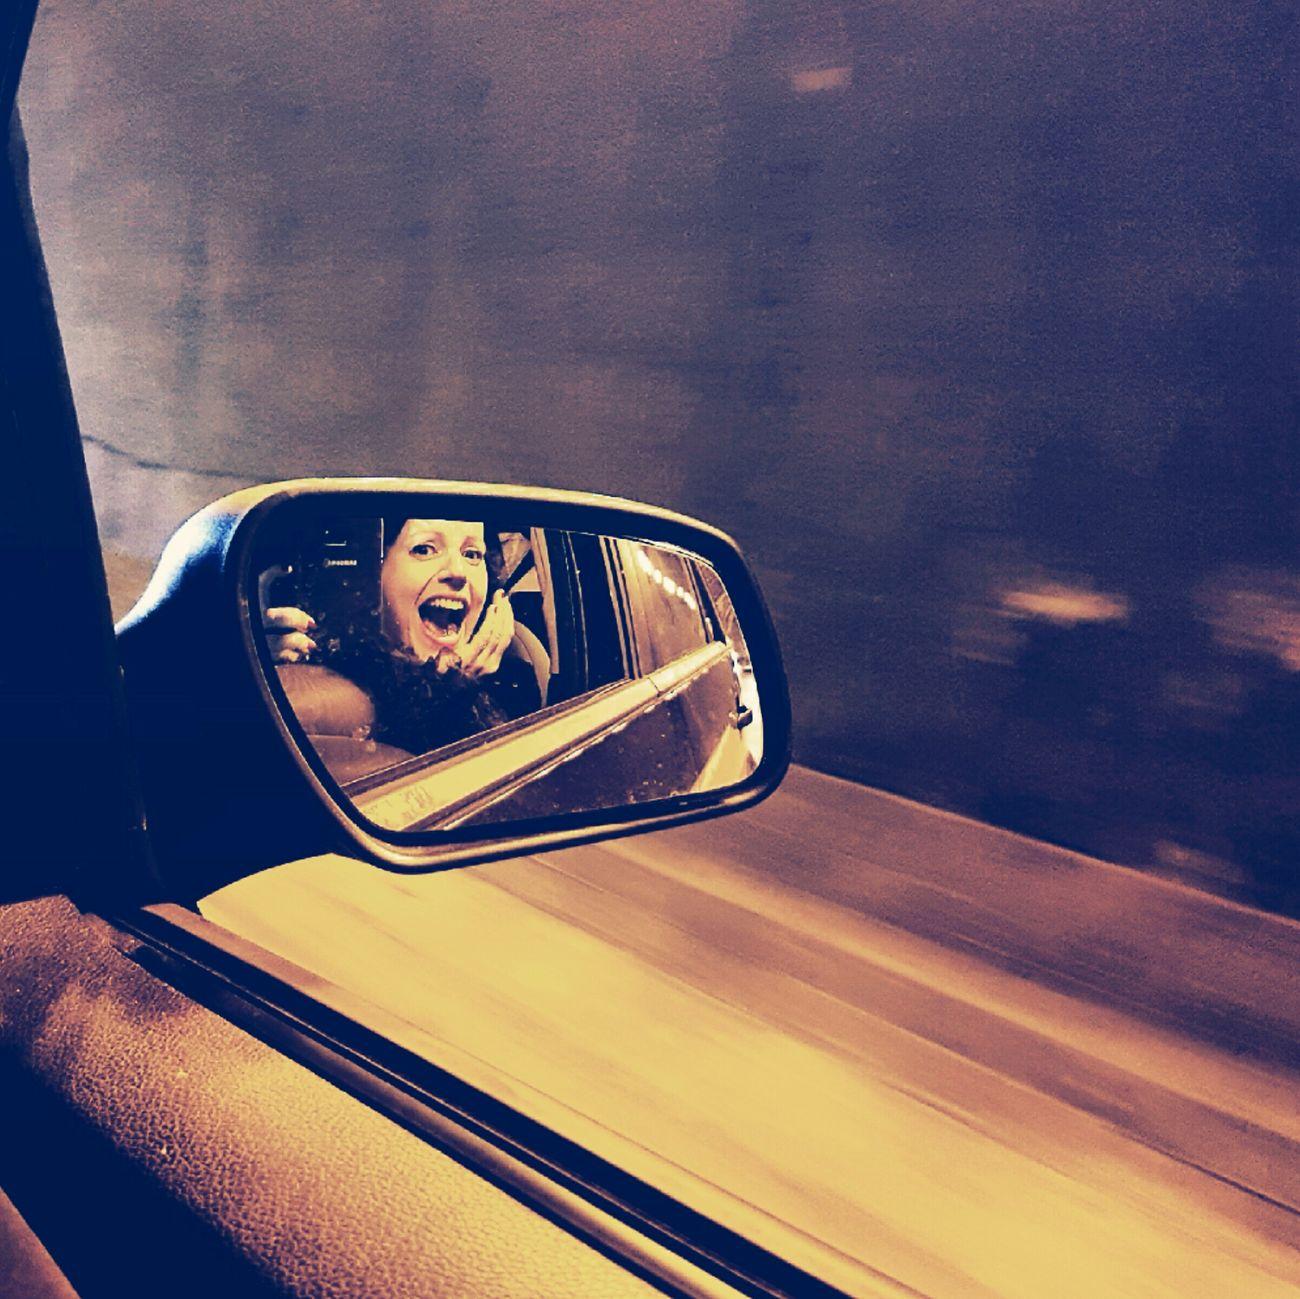 Aaaaahhhhh!!! Reflection Vehicle Mirror EyeEm Samsung Galaxy S7 Edge EyeEmNewHere My Fantastic World Journey Destination Retrato, Portrait, Profile Journey Into The Dark Journeyphotography Journey Is The Destination Live, Love, Laugh Life Is A Journey Life's Journey  Make Magic Happen EyeEm Best Shots EyeEmBestEdits Smiling New Life Love